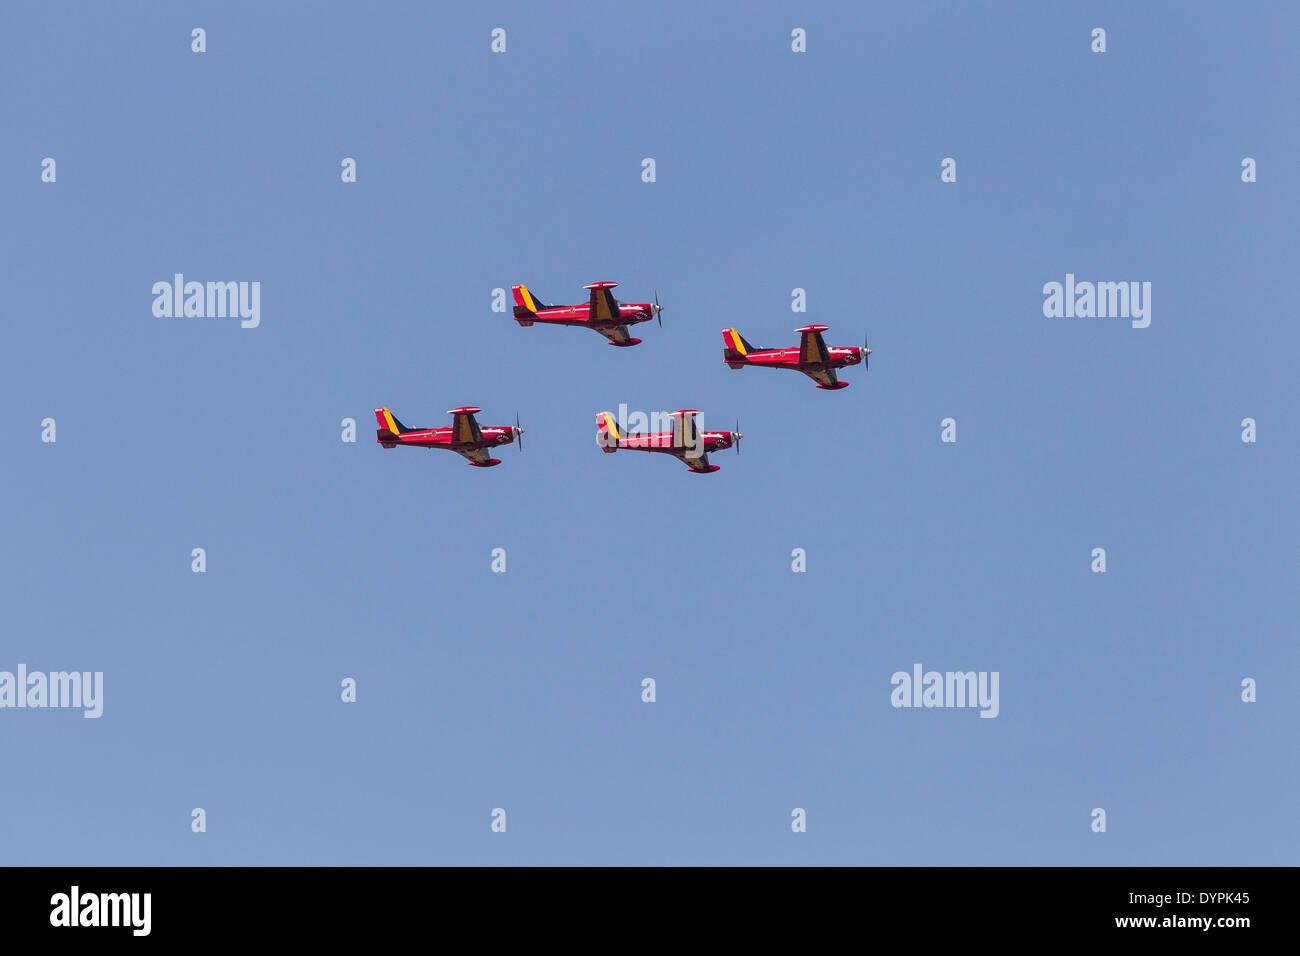 SIAI-Marchetti SF.260 basic trainer - Stock Image